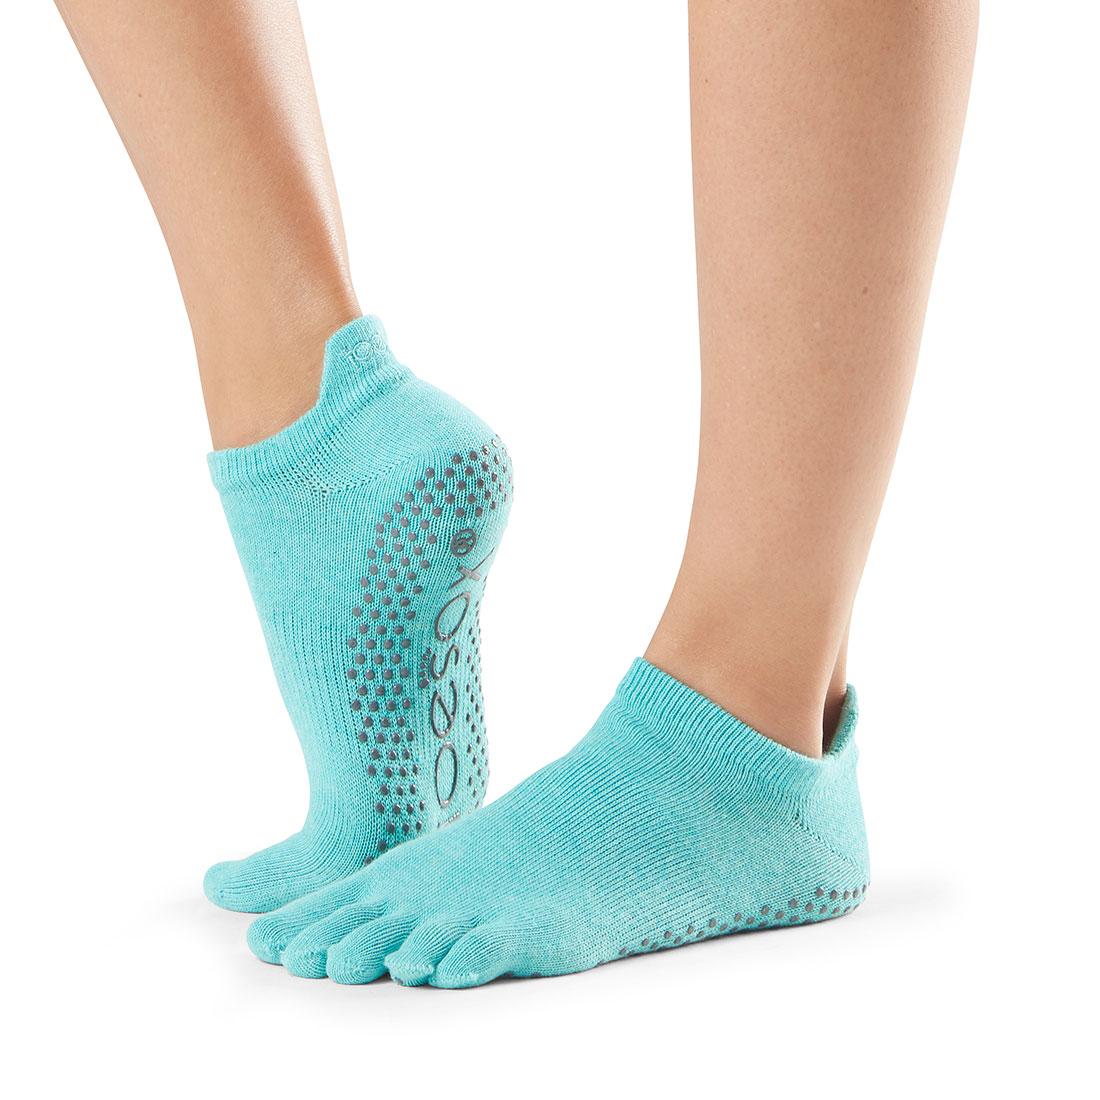 Yogasocken ToeSox Low Rise Full Toe Aqua - 1